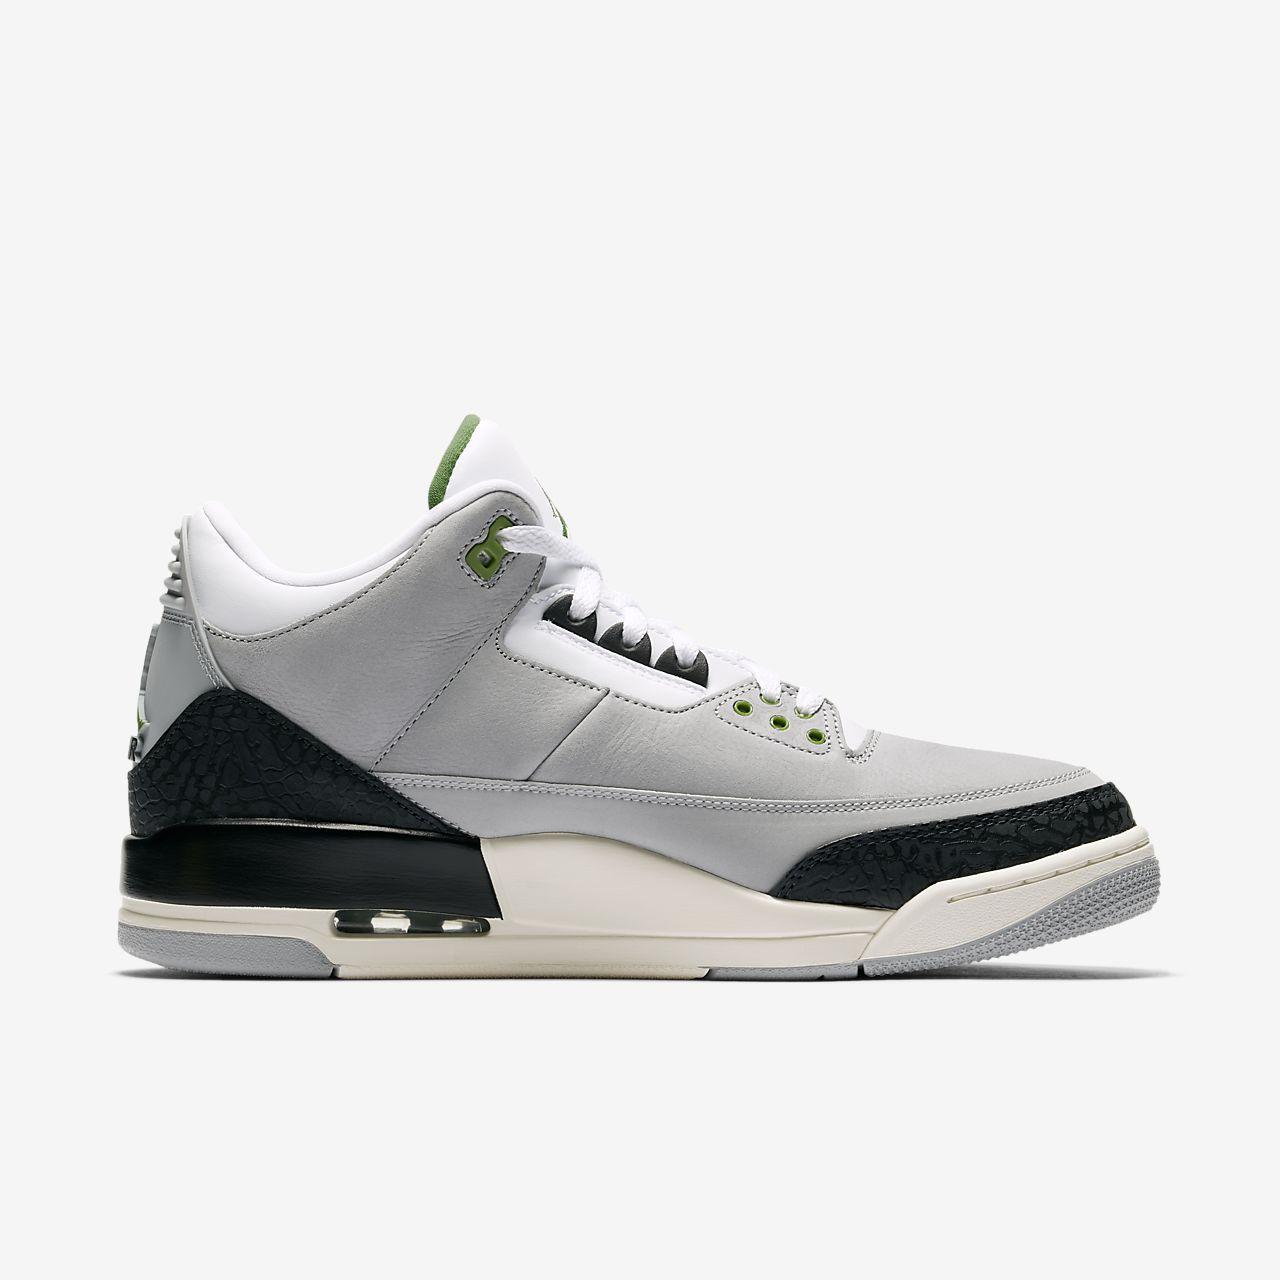 8993a8cbb63 Air Jordan 3 Retro Men's Shoe. Nike.com DK